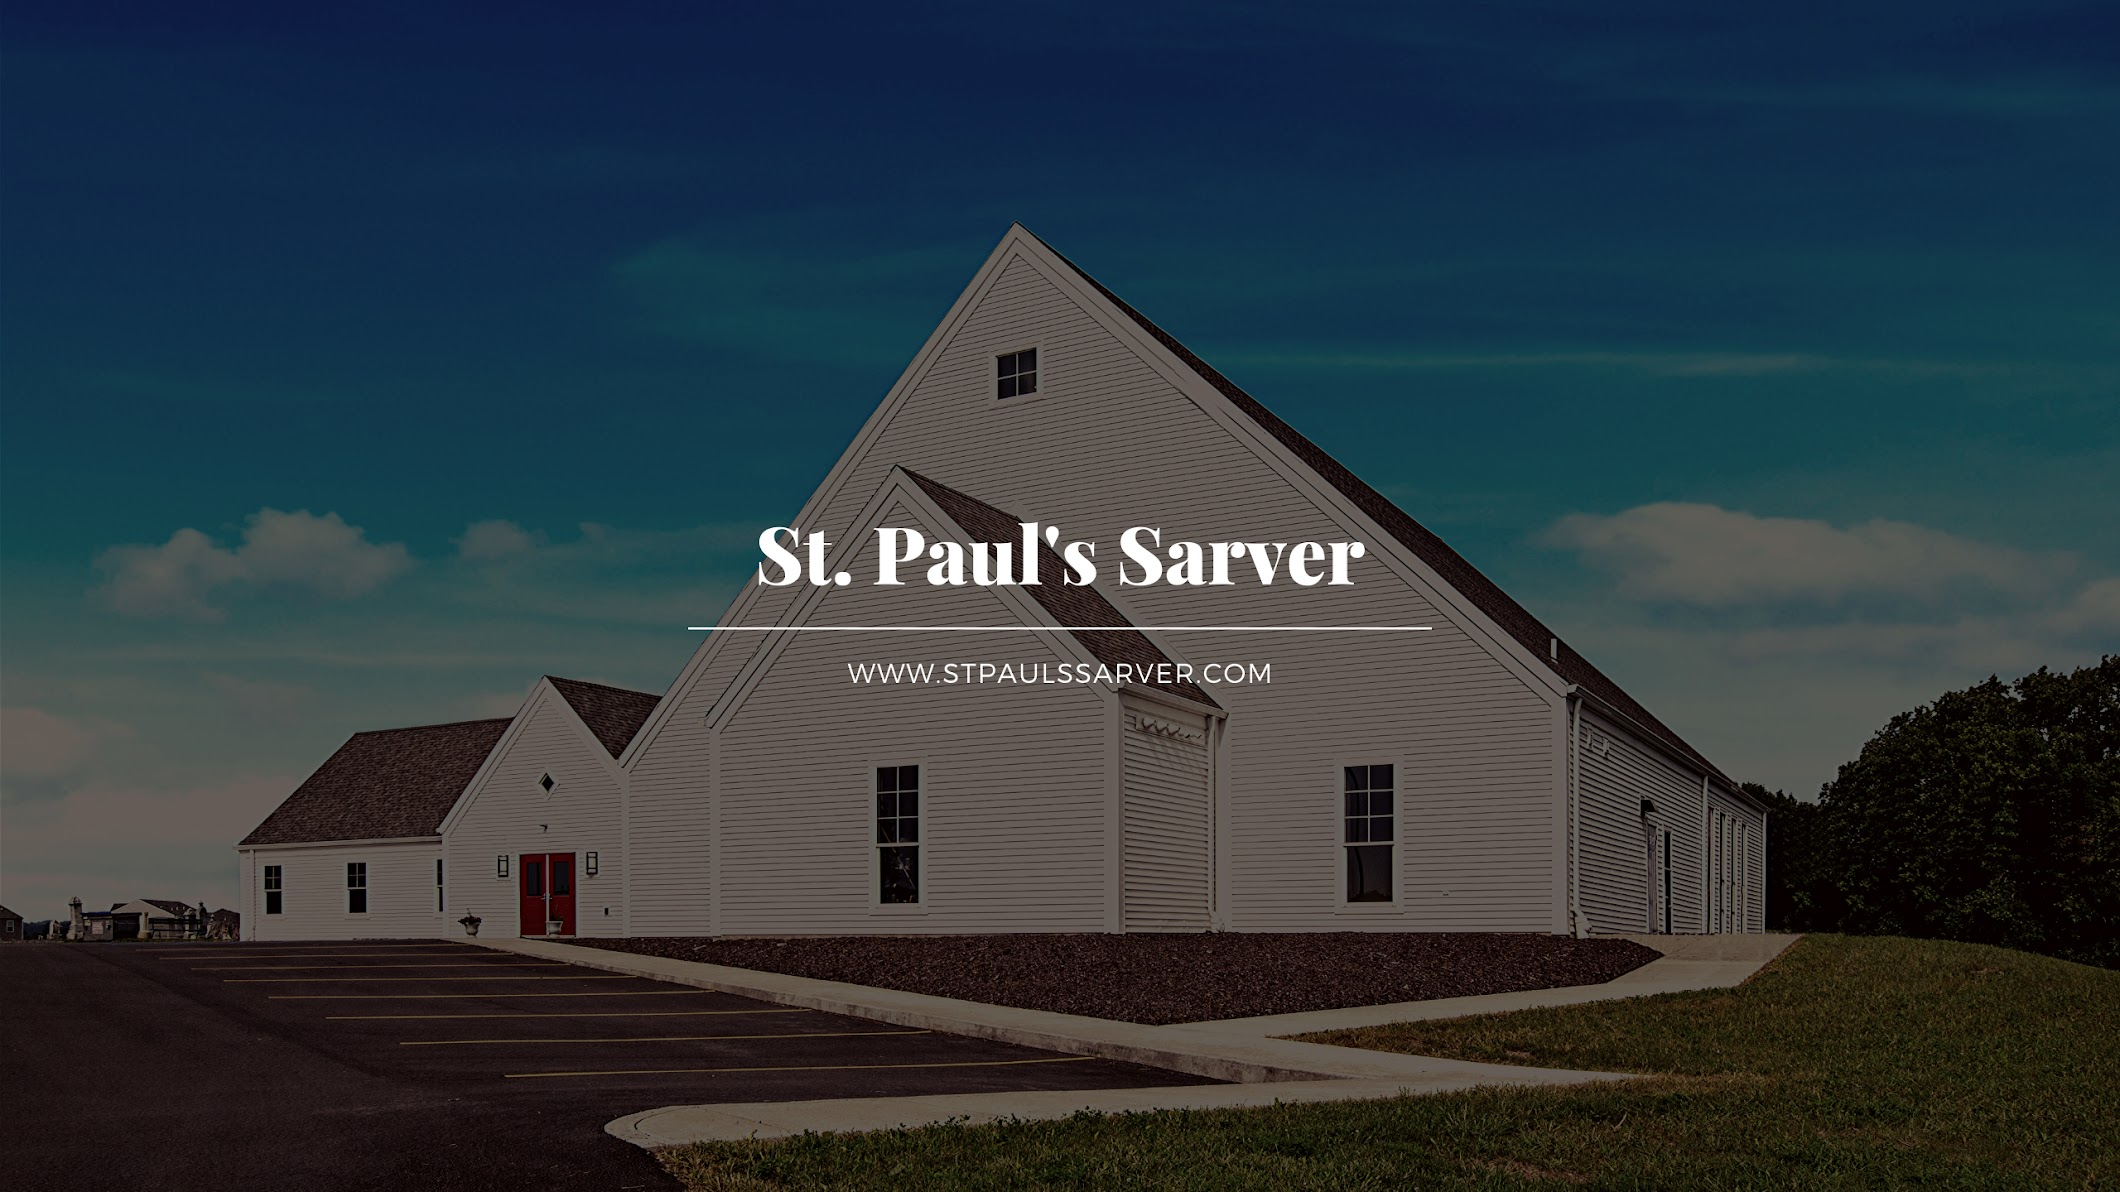 St. Paul's Sarver